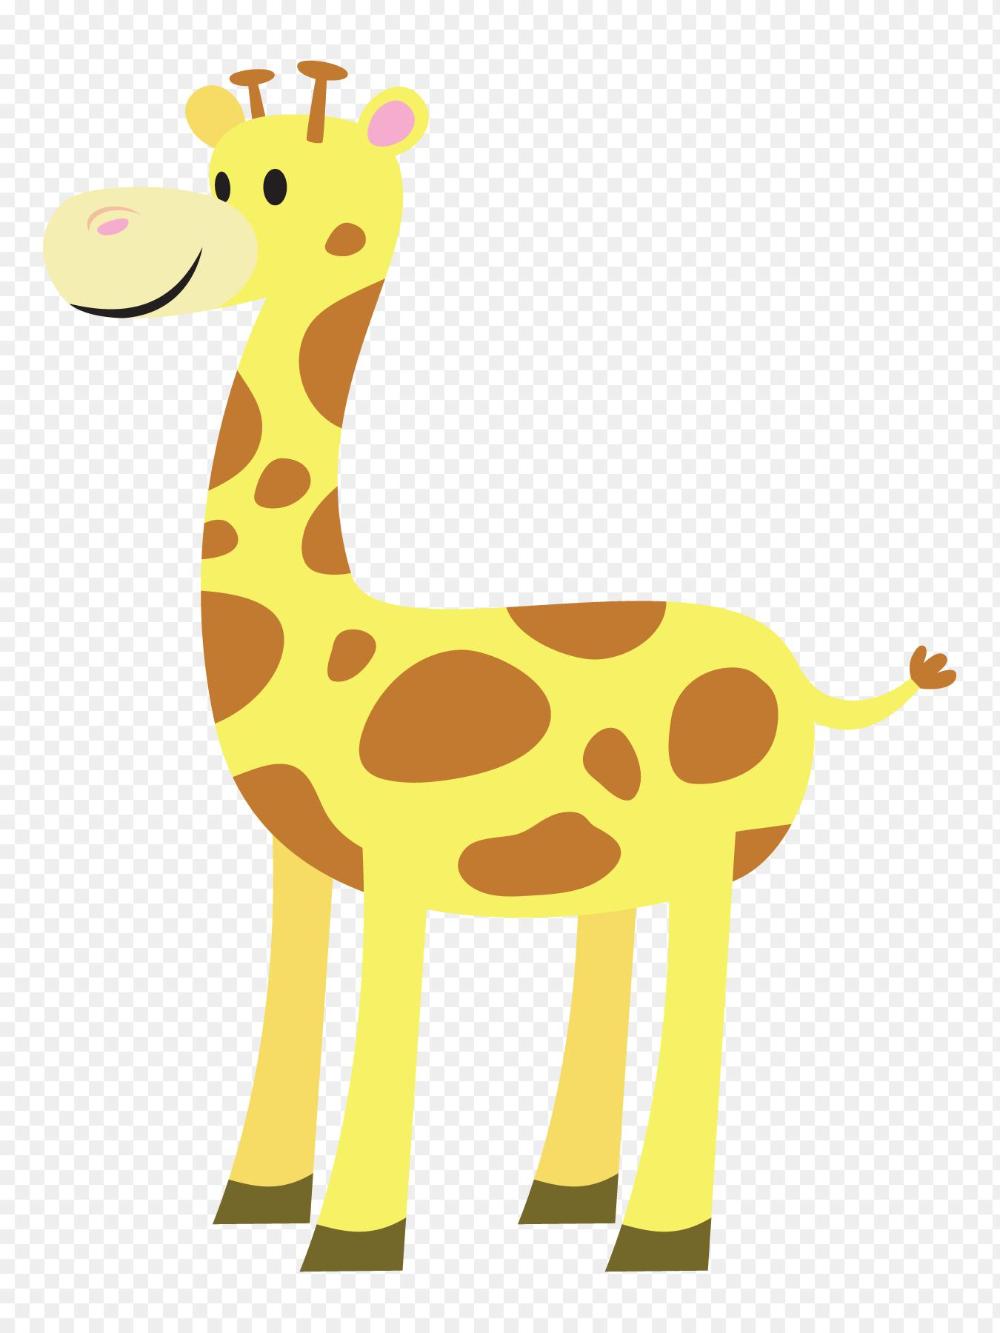 Giraffe Clipart Png Giraffe Clip Art Clipart Panda Free Clipart Images 1350 1800 Png Download Free Transpare In 2020 Cartoon Clip Art Giraffe Art Cartoon Giraffe